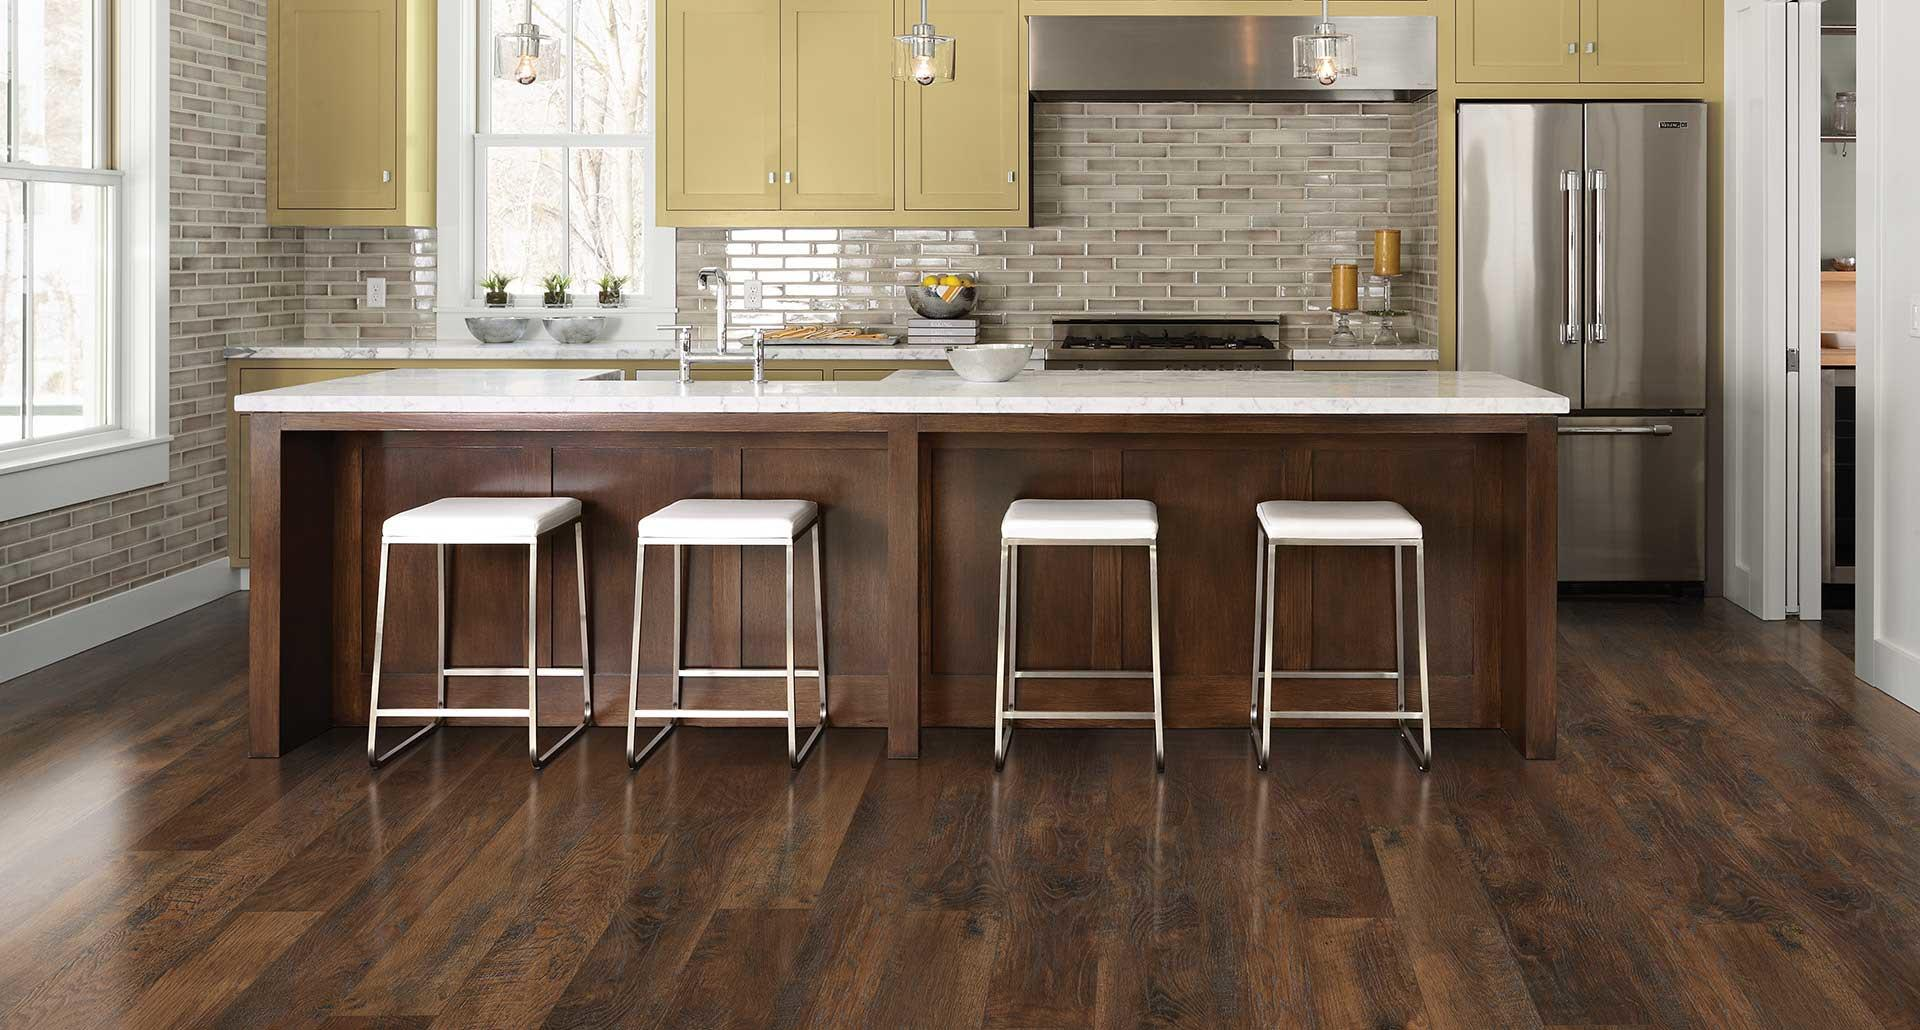 Floor Project Wichita Ks.LK Architecture Via Christi HOPE Wichita KS ...